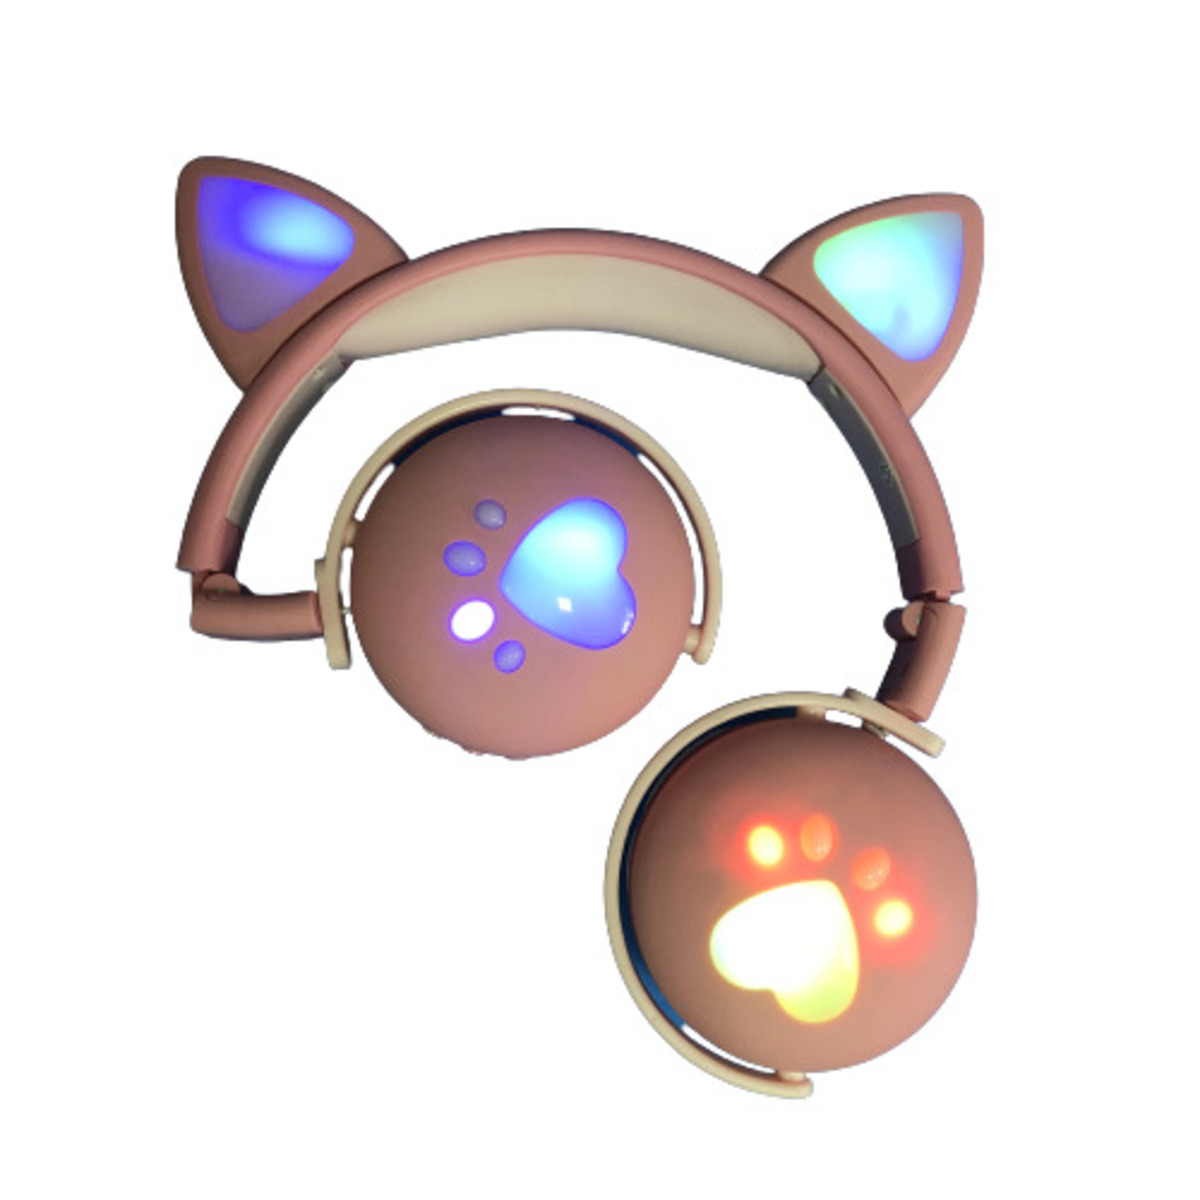 Fone De Ouvido Bluetooth Led Orelha Gato Infantil Headphone Rosa